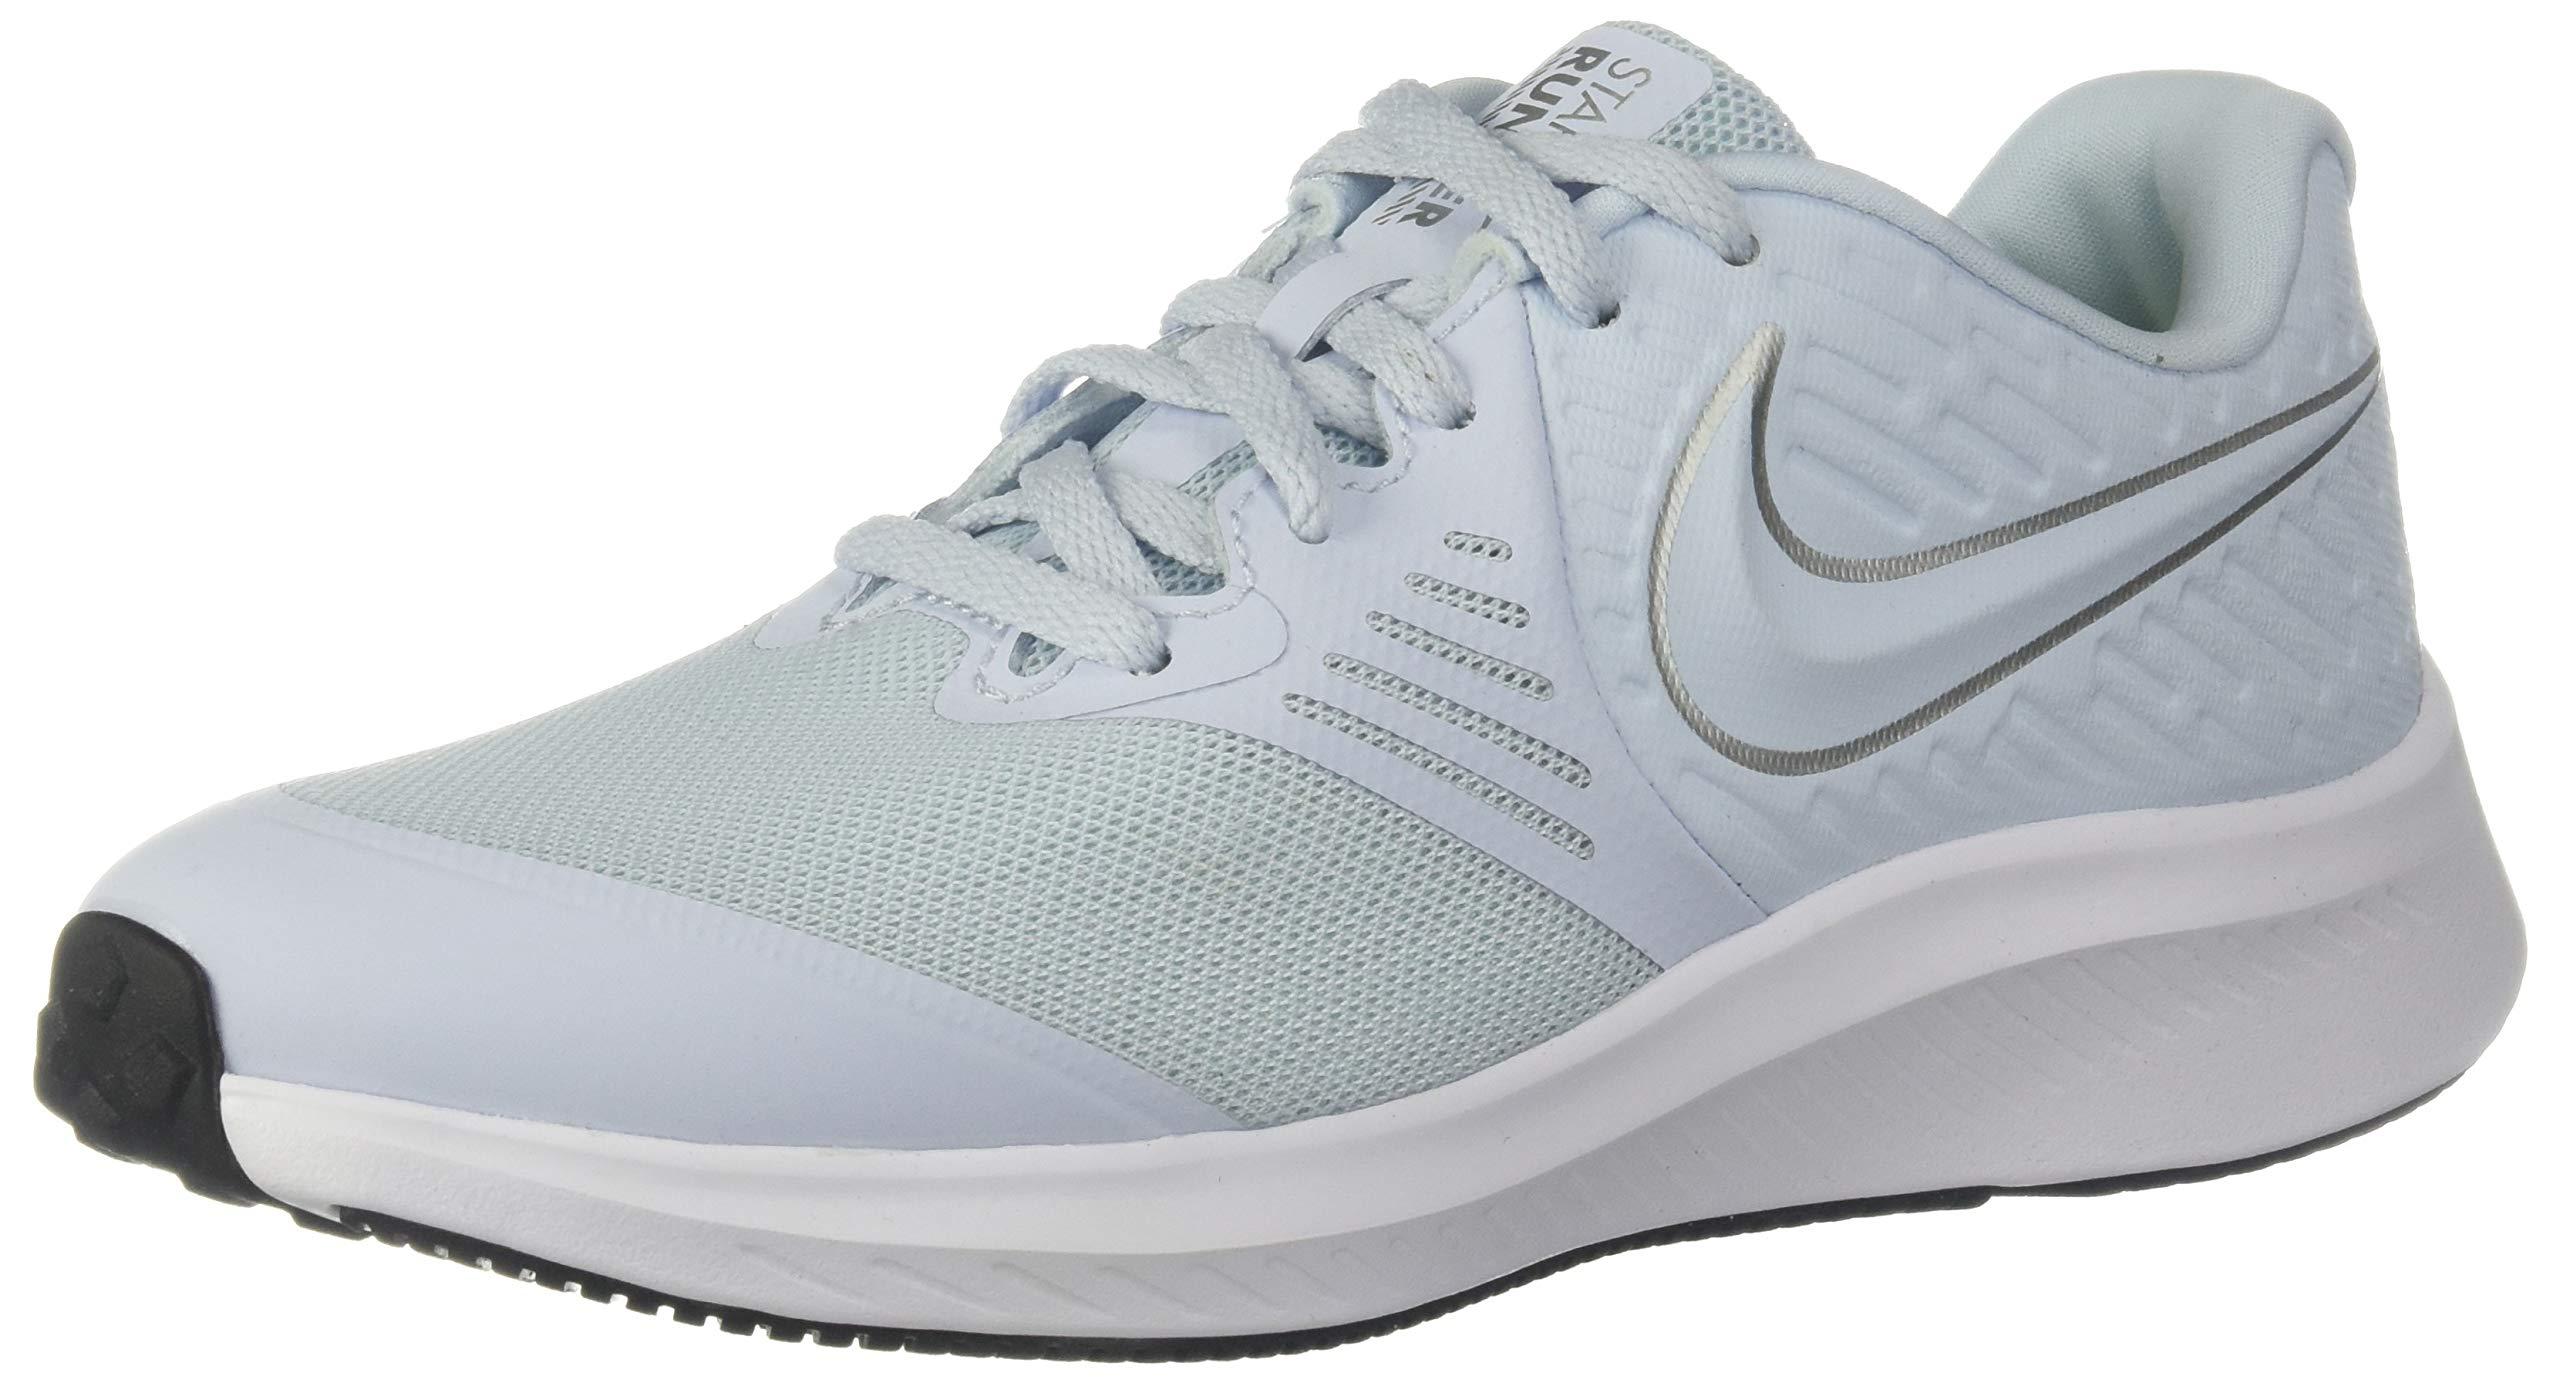 Nike Boys Star Runner 2 (GS) Sneaker, Half Blue/Metallic Silver-Volt, 6Y Youth US Big Kid by Nike